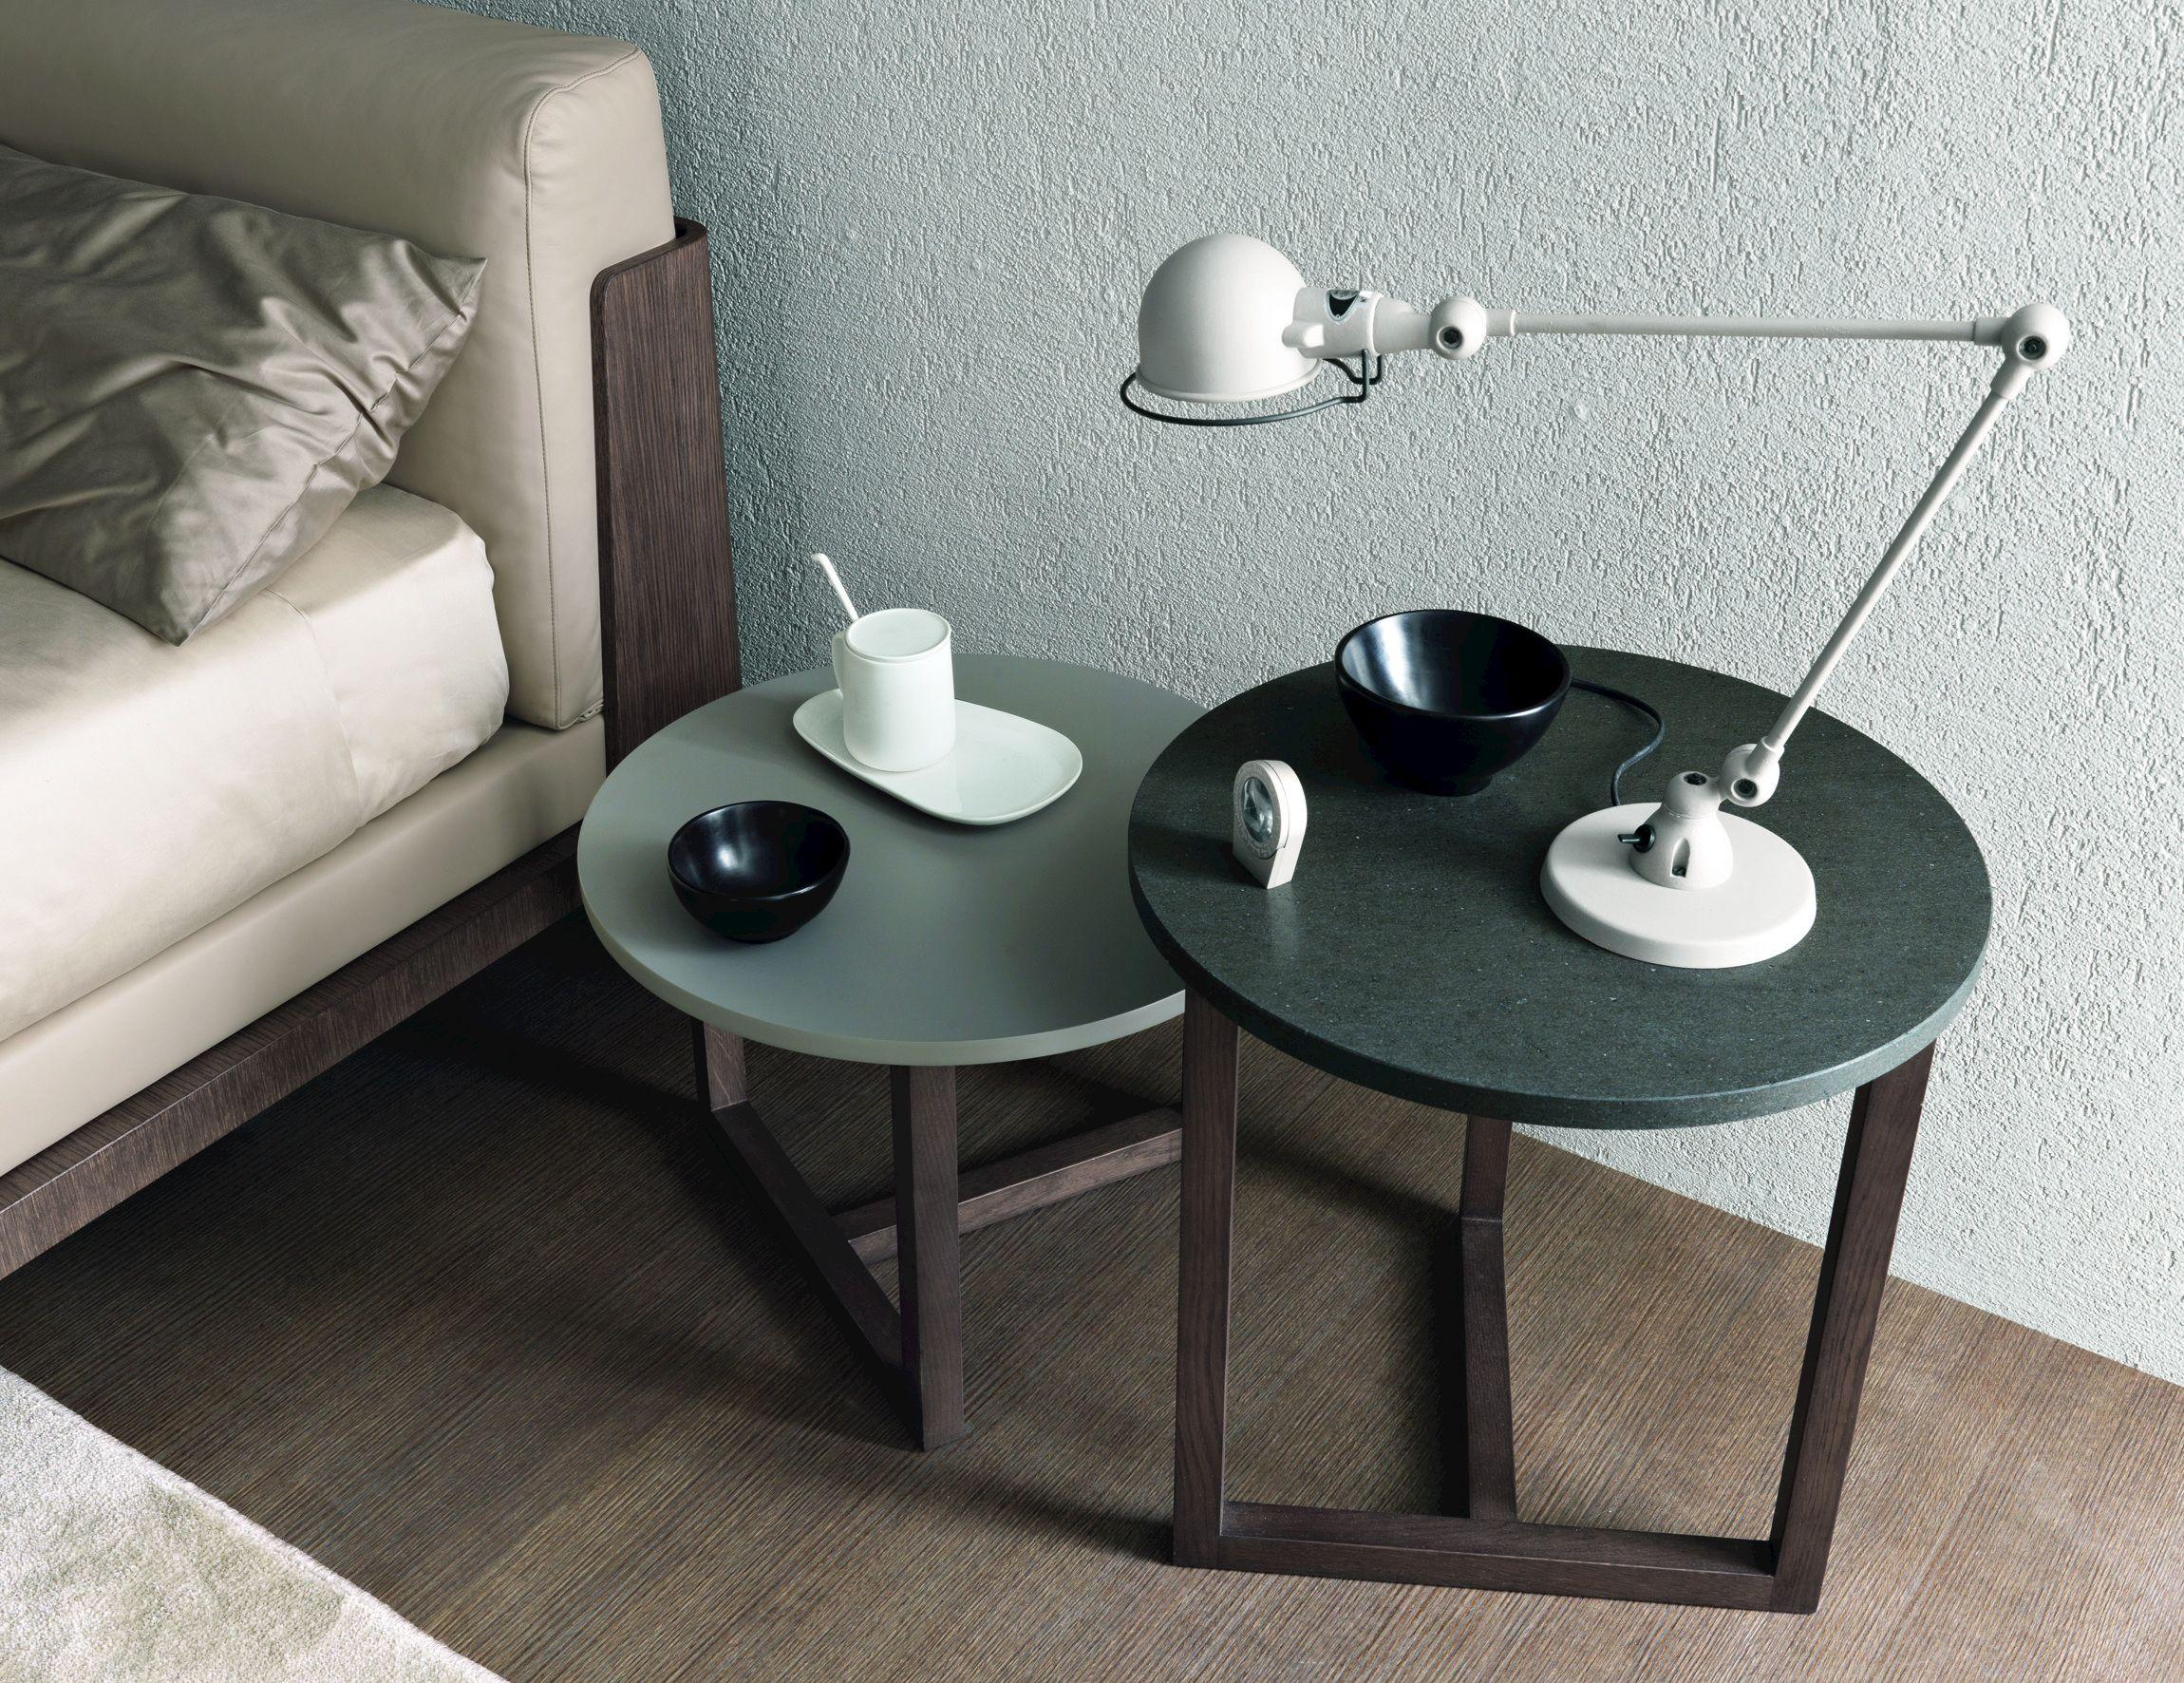 Tavolino comodino in marmo hill tavolino rotondo - Tavolino comodino ...